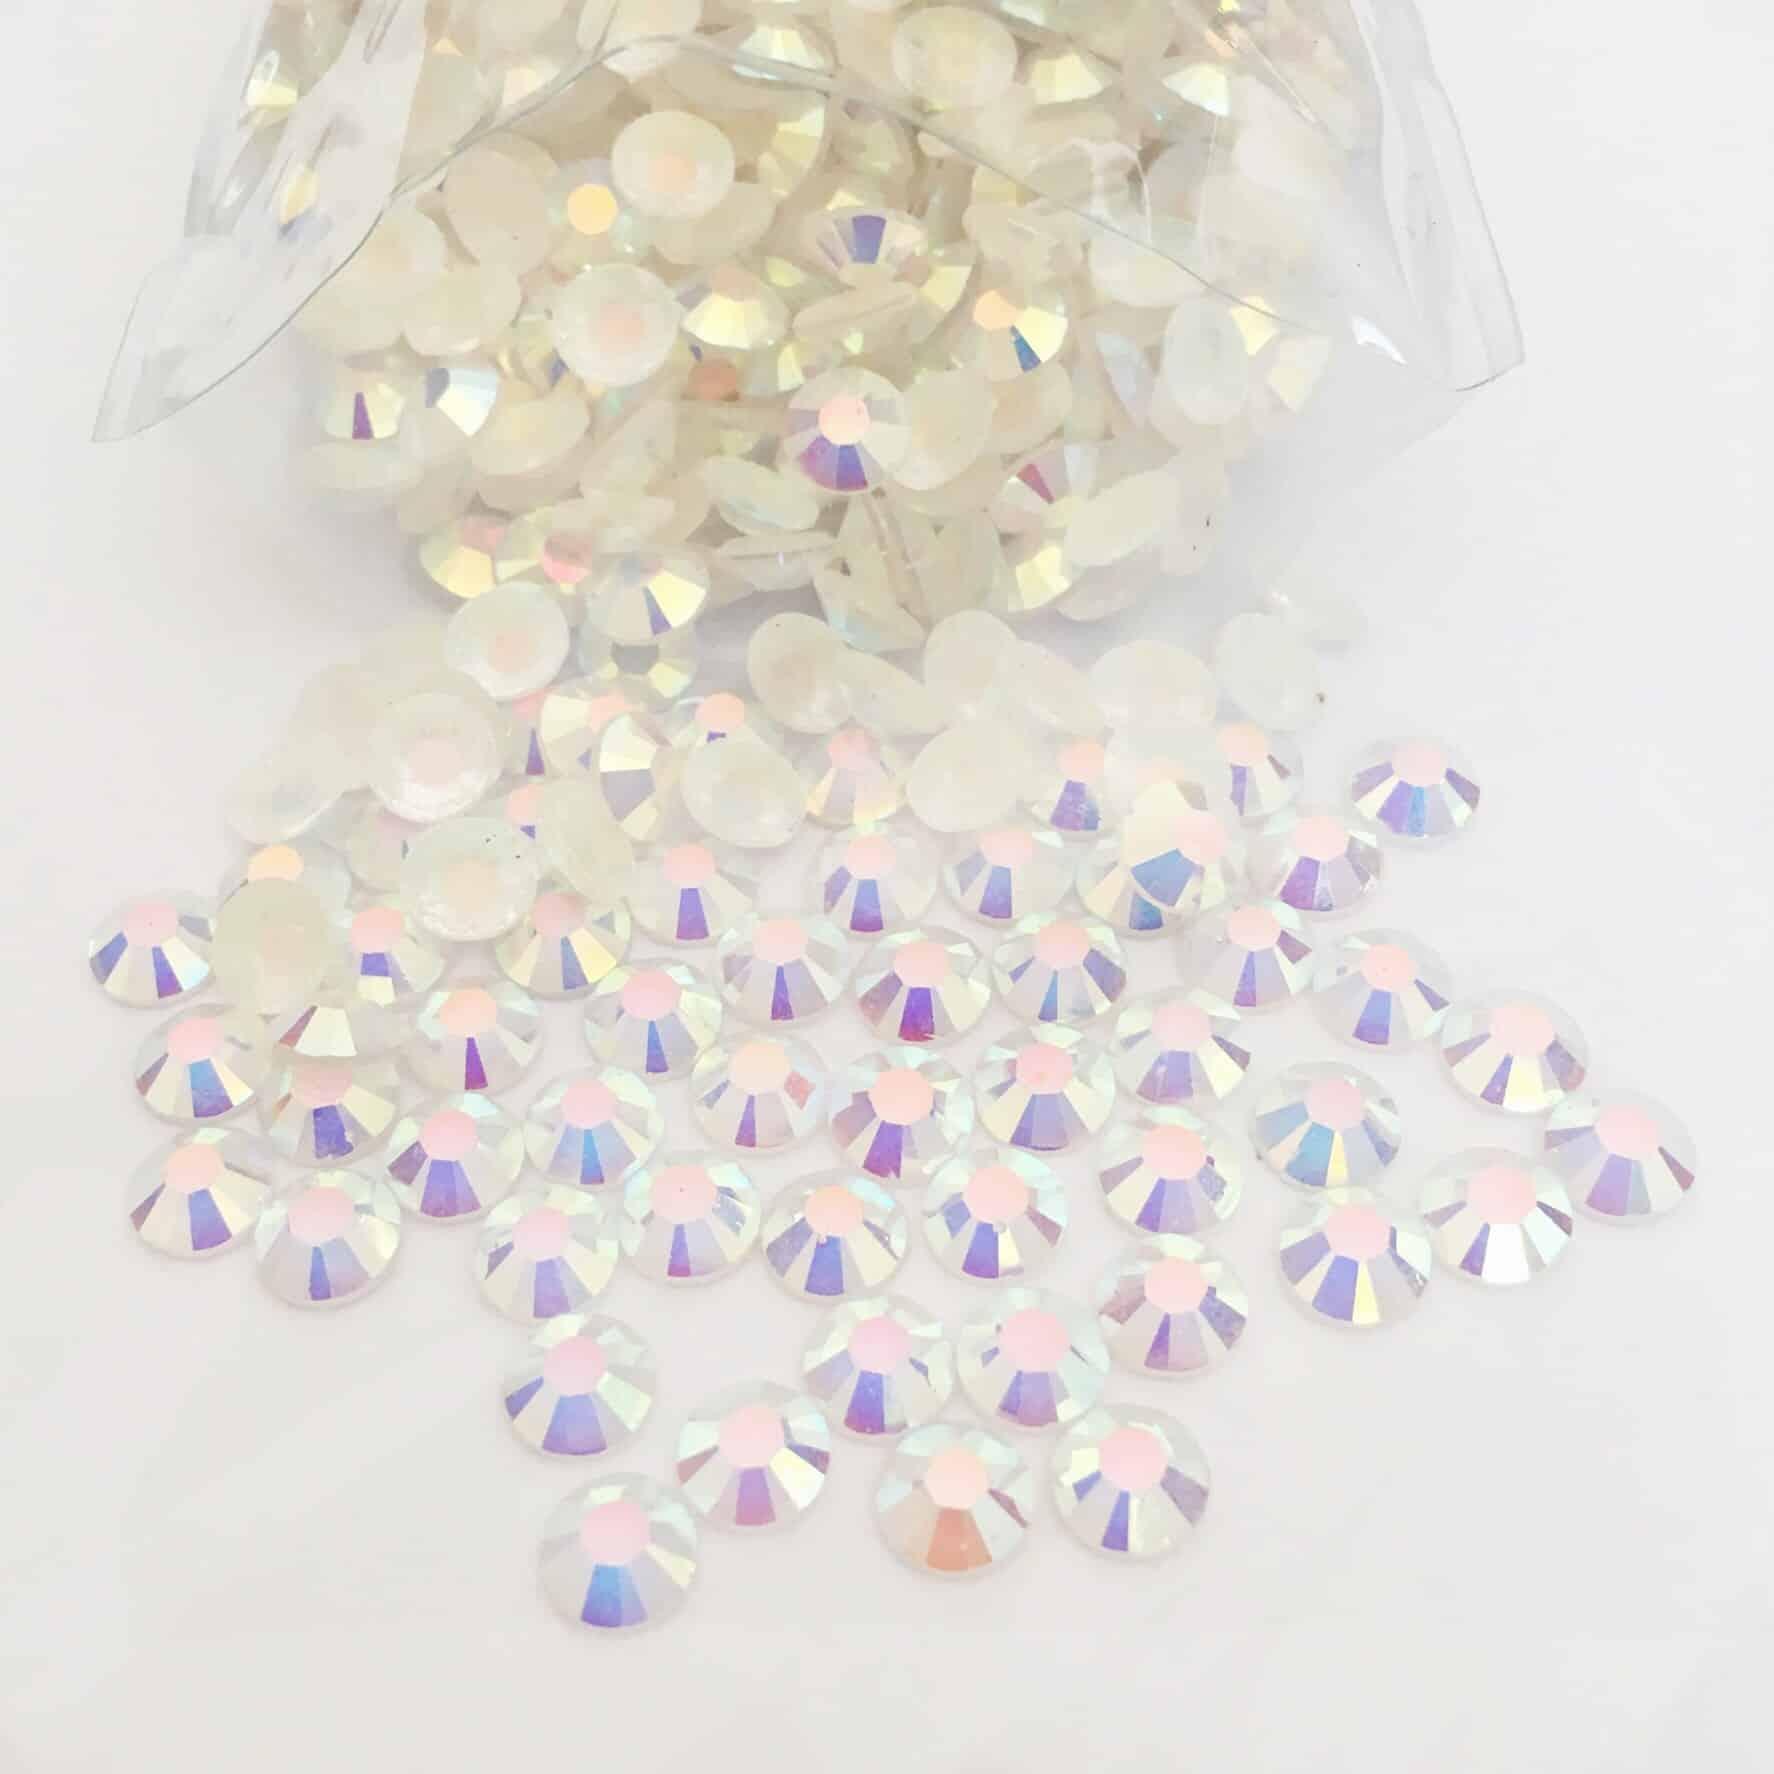 Acrylic Flatback Gem Stones (Clear AB) SS30 (PACK OF 1000)